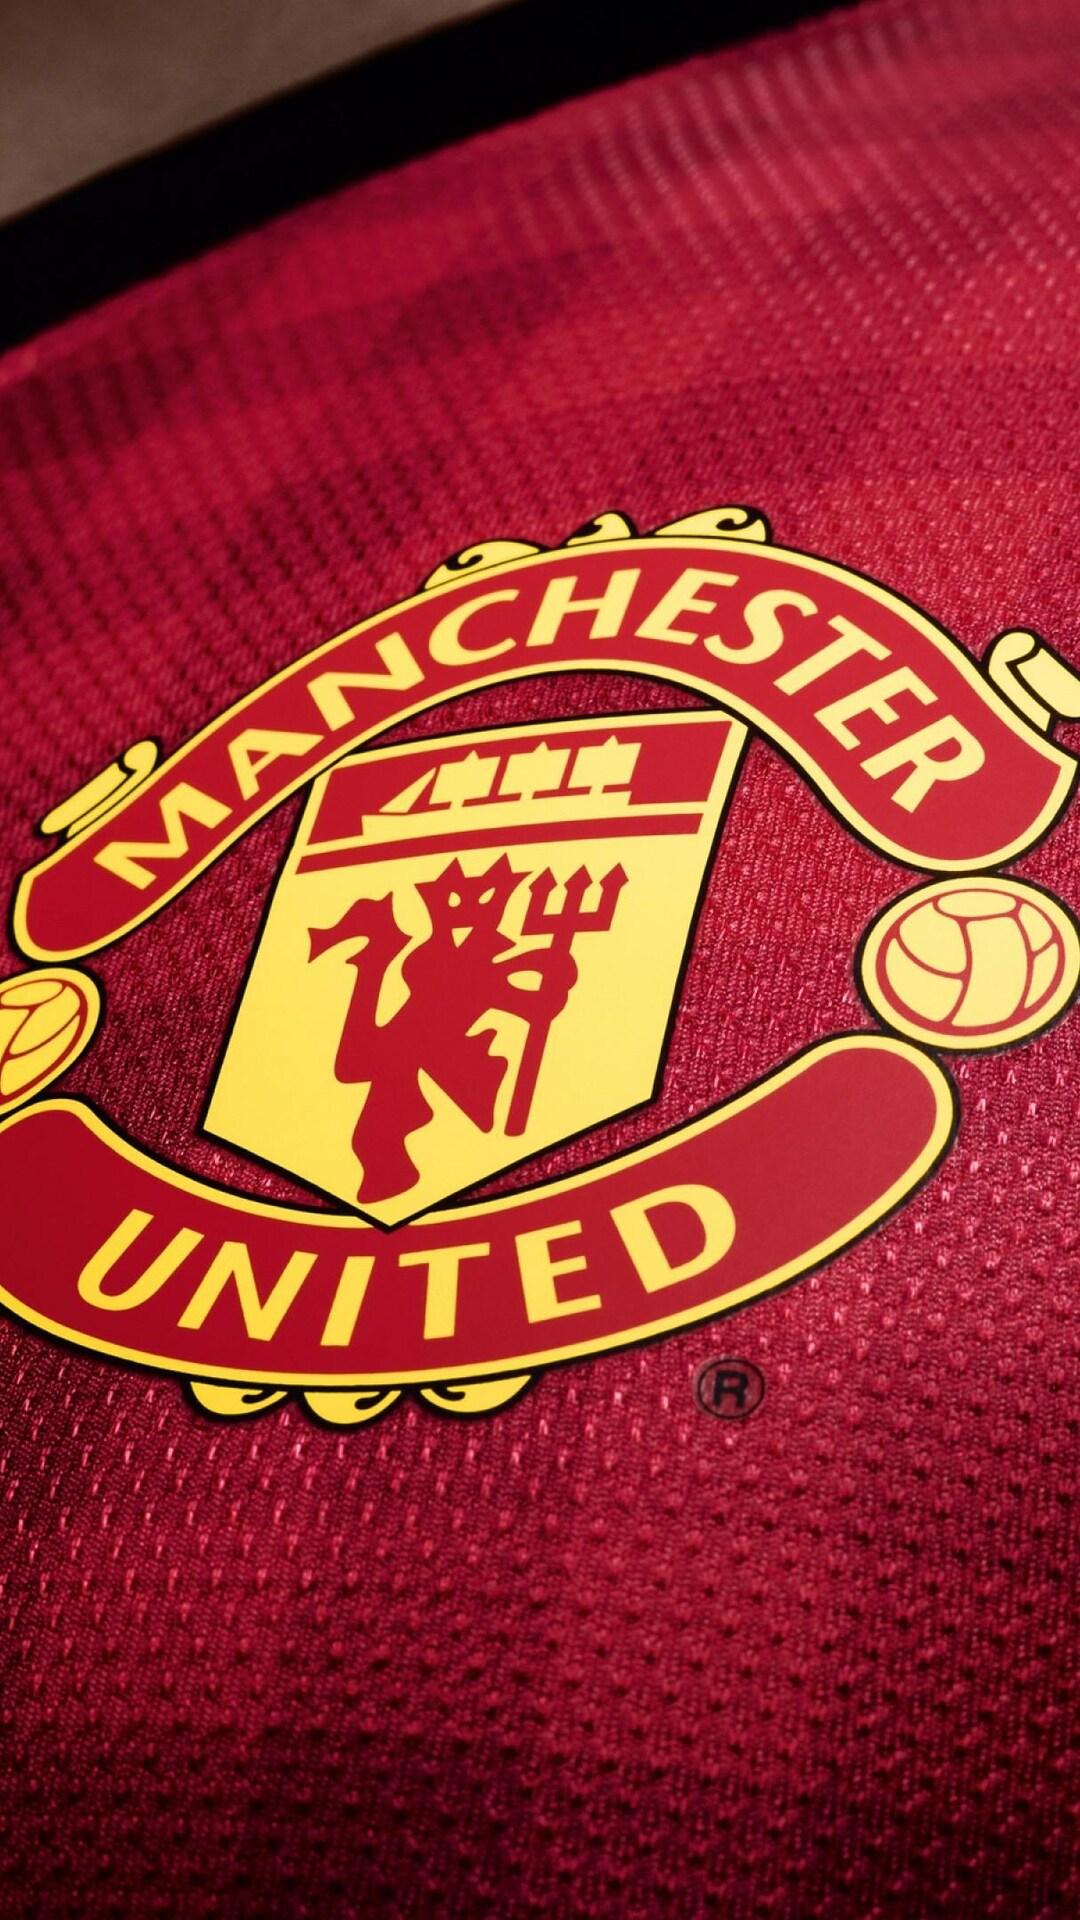 1080x1920 Manchester United Logo Iphone 7 6s 6 Plus Pixel